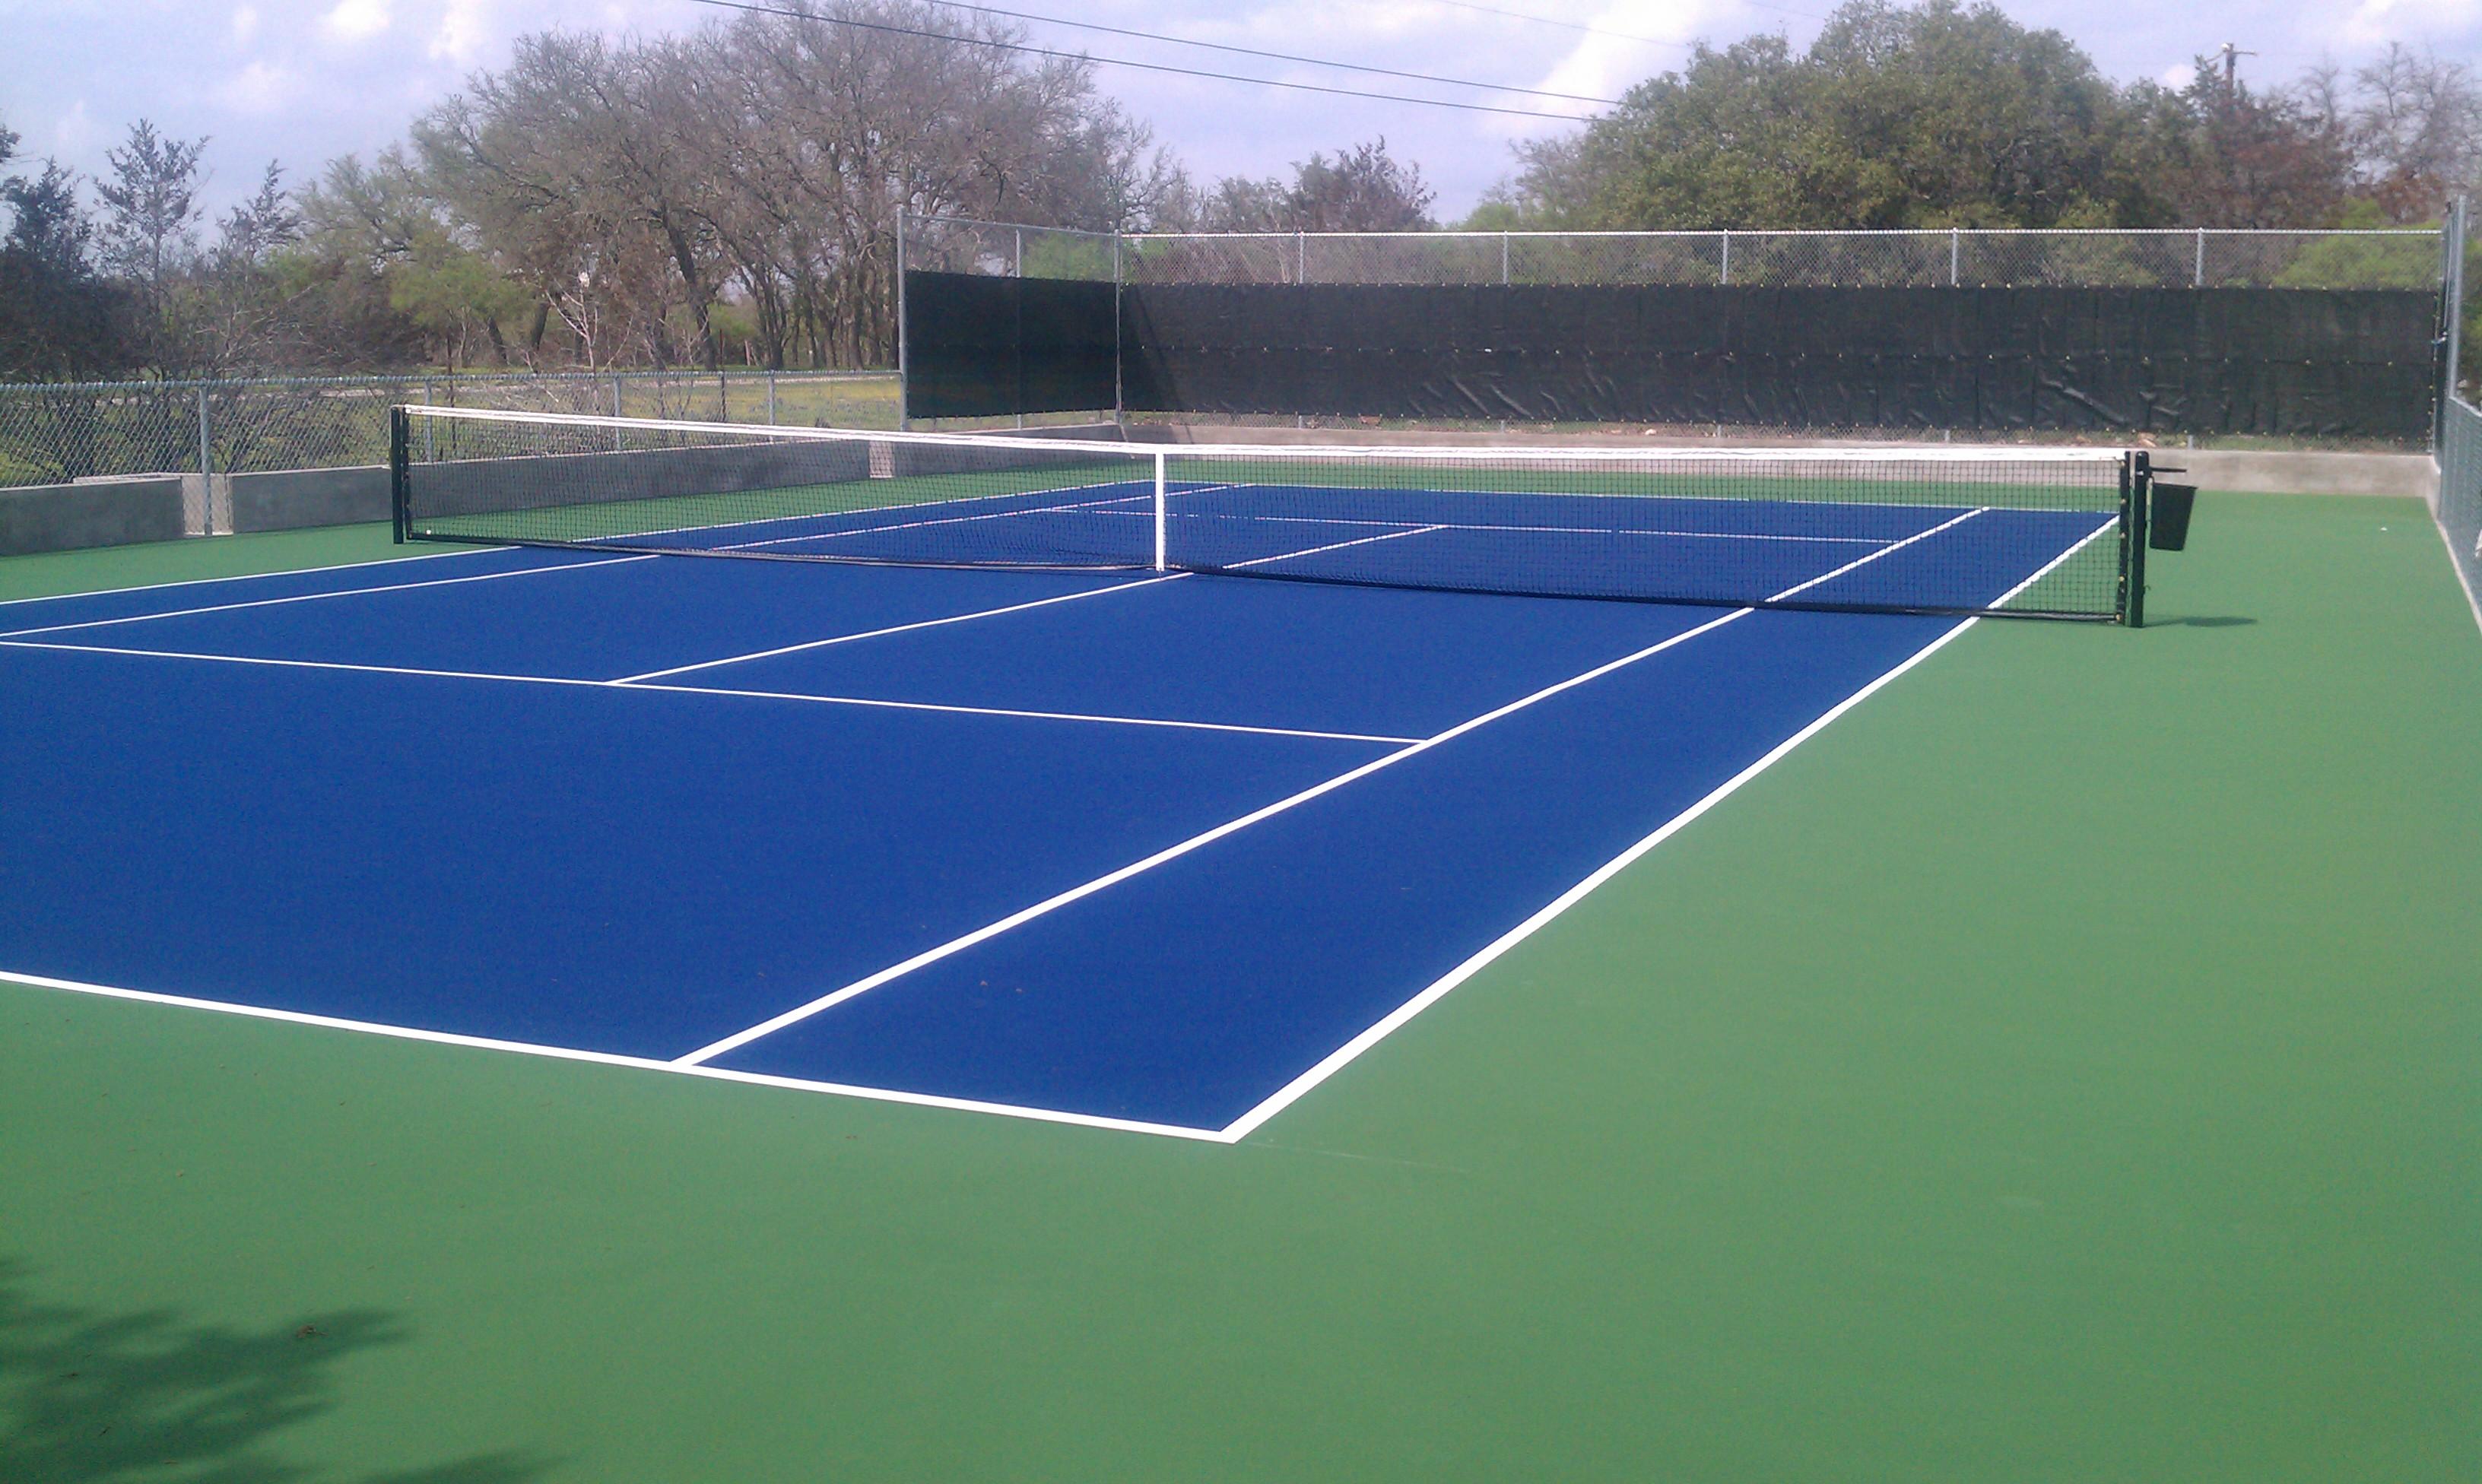 Home - Dobbs Tennis Courts, Inc.